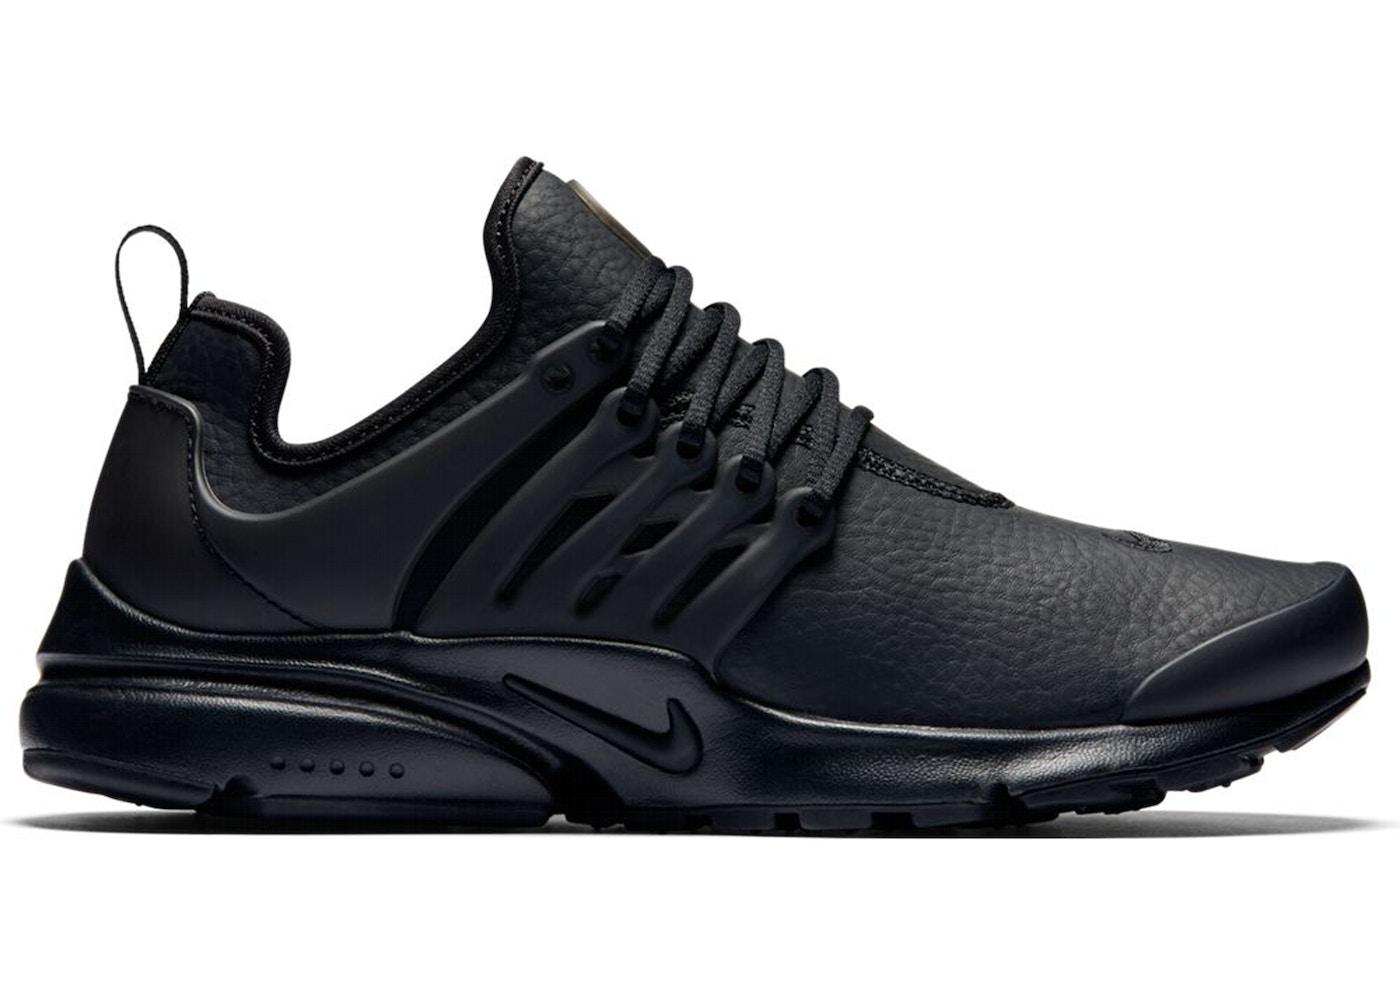 Nike Air Presto Premium Black Leather (W) - 878071-002